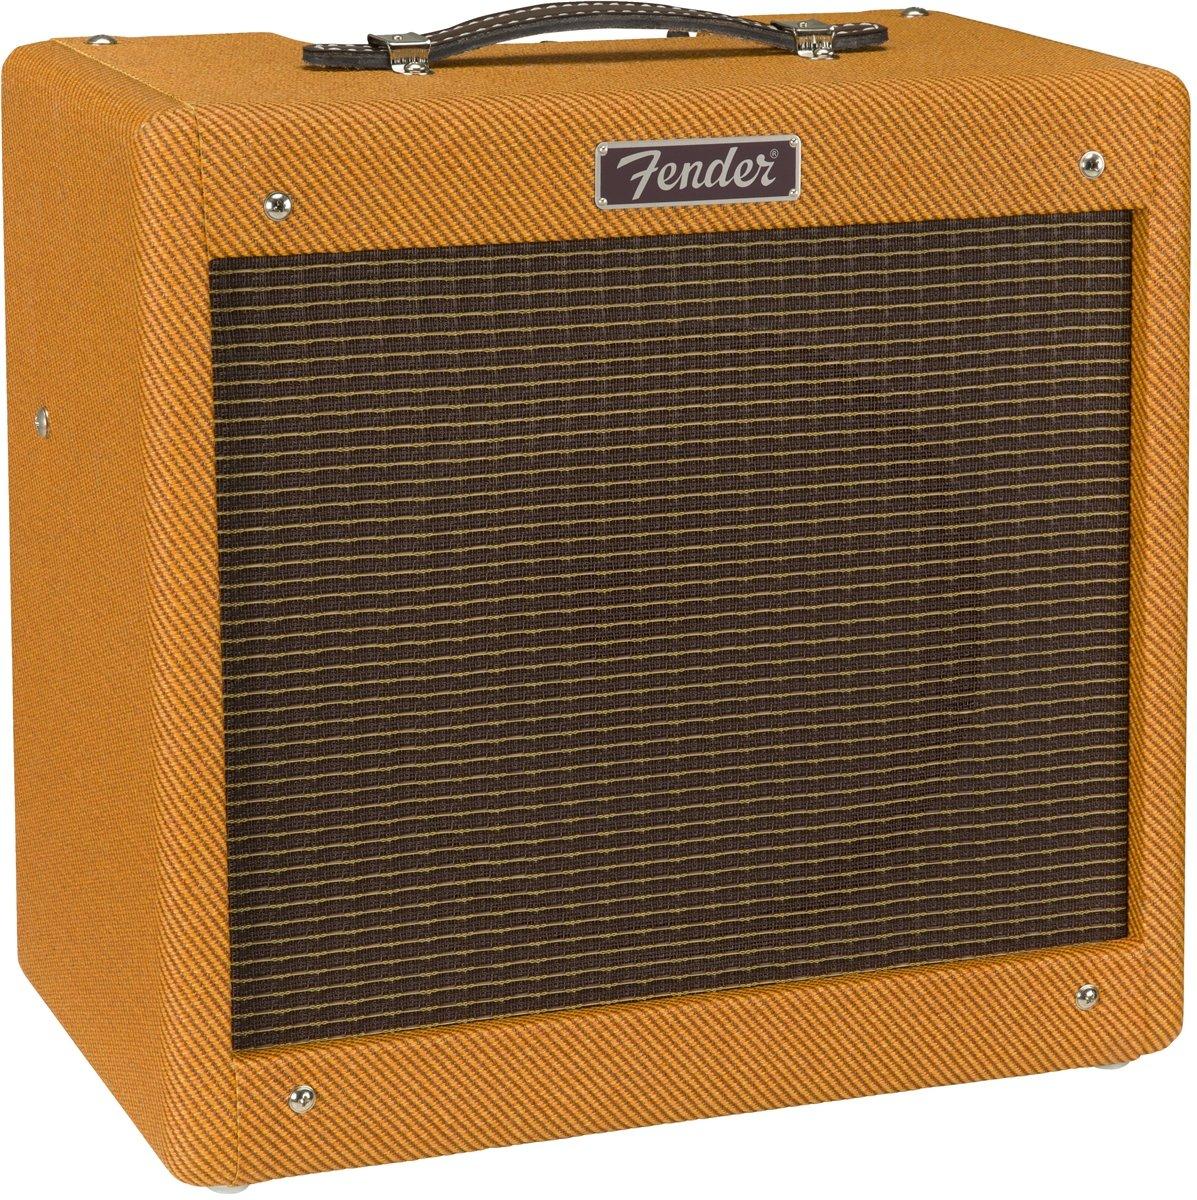 Fender Pro Jr IV Ltd